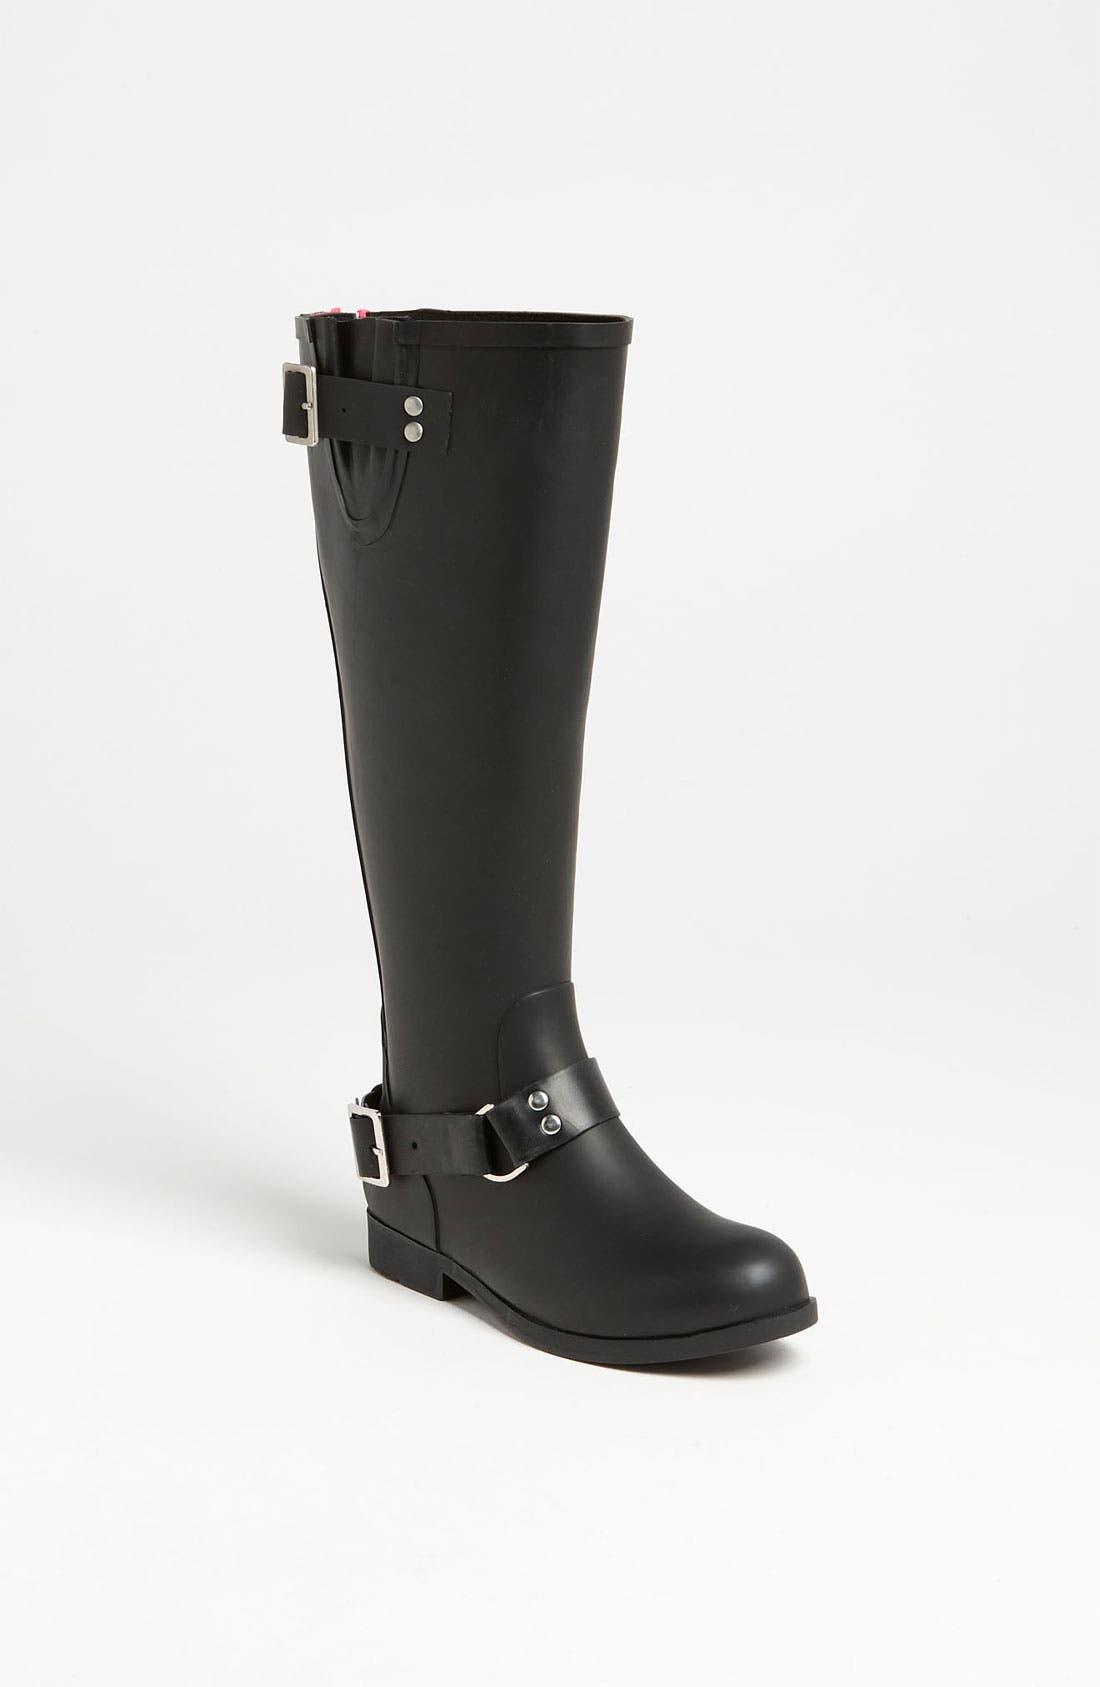 Alternate Image 1 Selected - Steve Madden 'Tsunamii' Contrast Zip Rain Boot (Women)